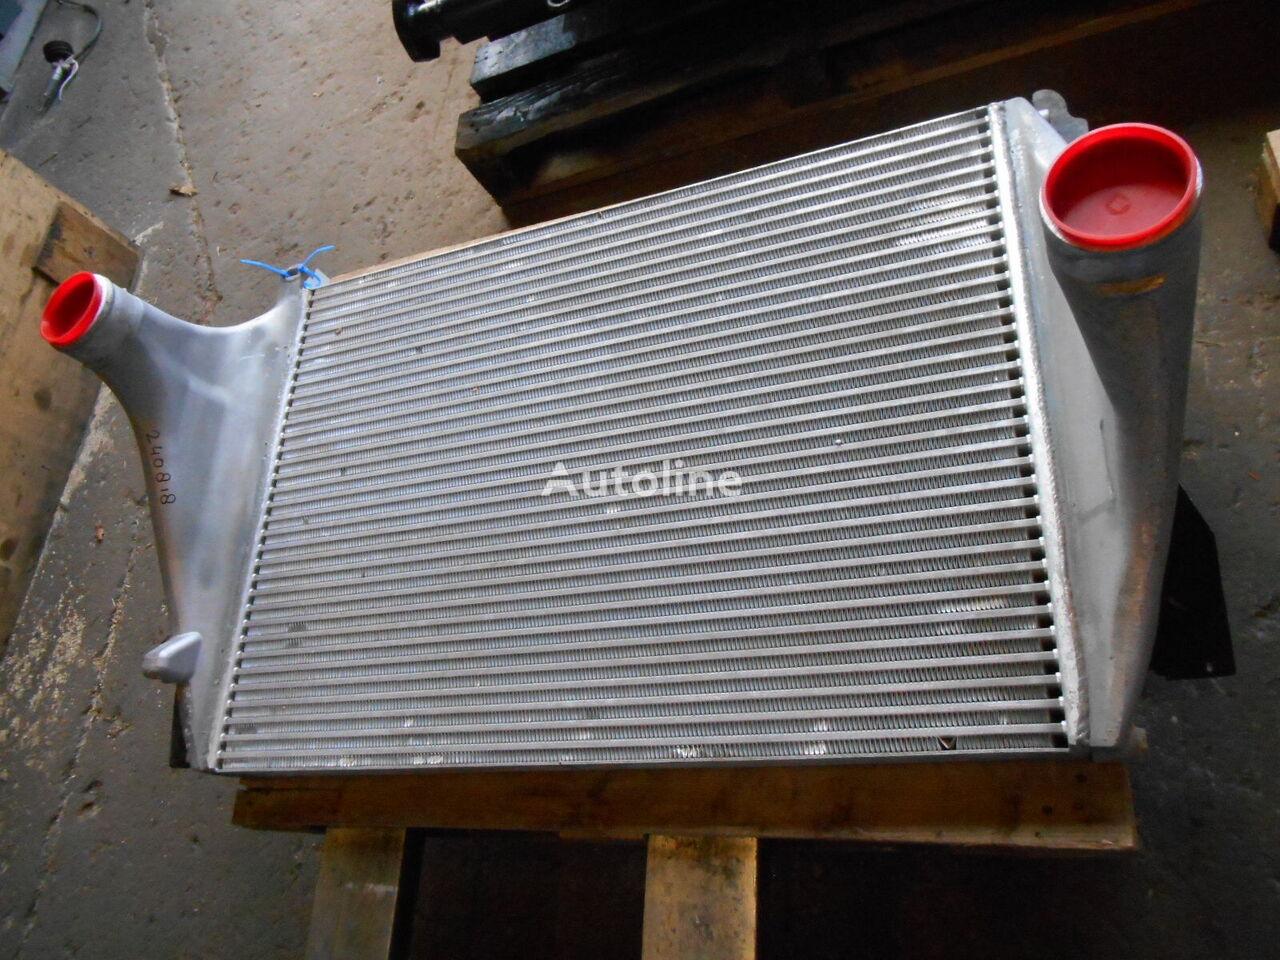 FREIGHTLINER Behr D3523 (BHTD3523) engine cooling radiator for FREIGHTLINER tractor unit